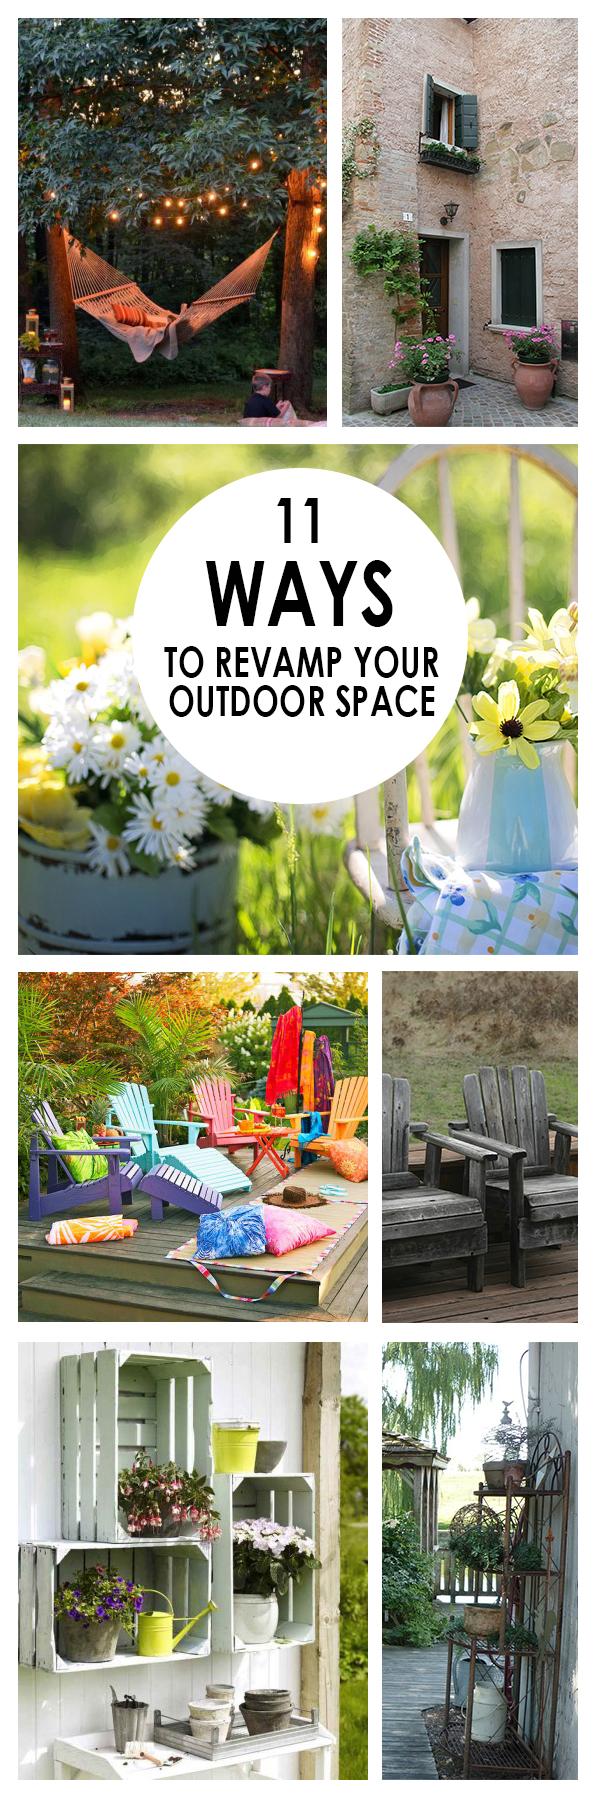 Outdoor living, outdoor tips and tricks, backyard updates, gardening DIY, summer activities, bees and roses